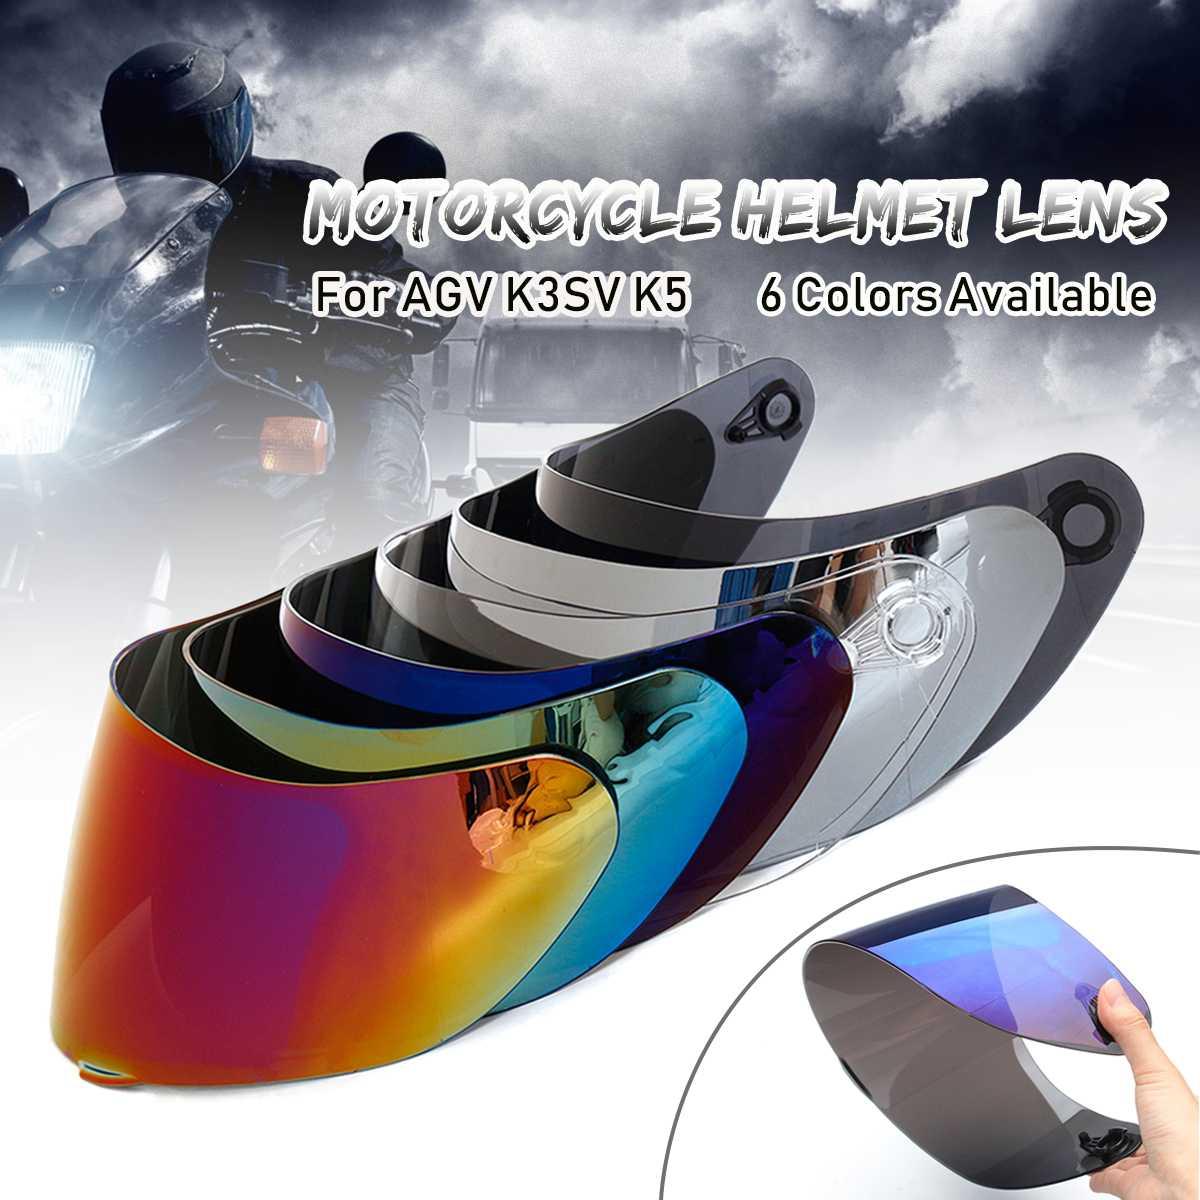 Visera del casco para AGV K5 K3 SV casco de la motocicleta escudo partes original gafas para agv k3 sv k5 moto casco lente de cara completa